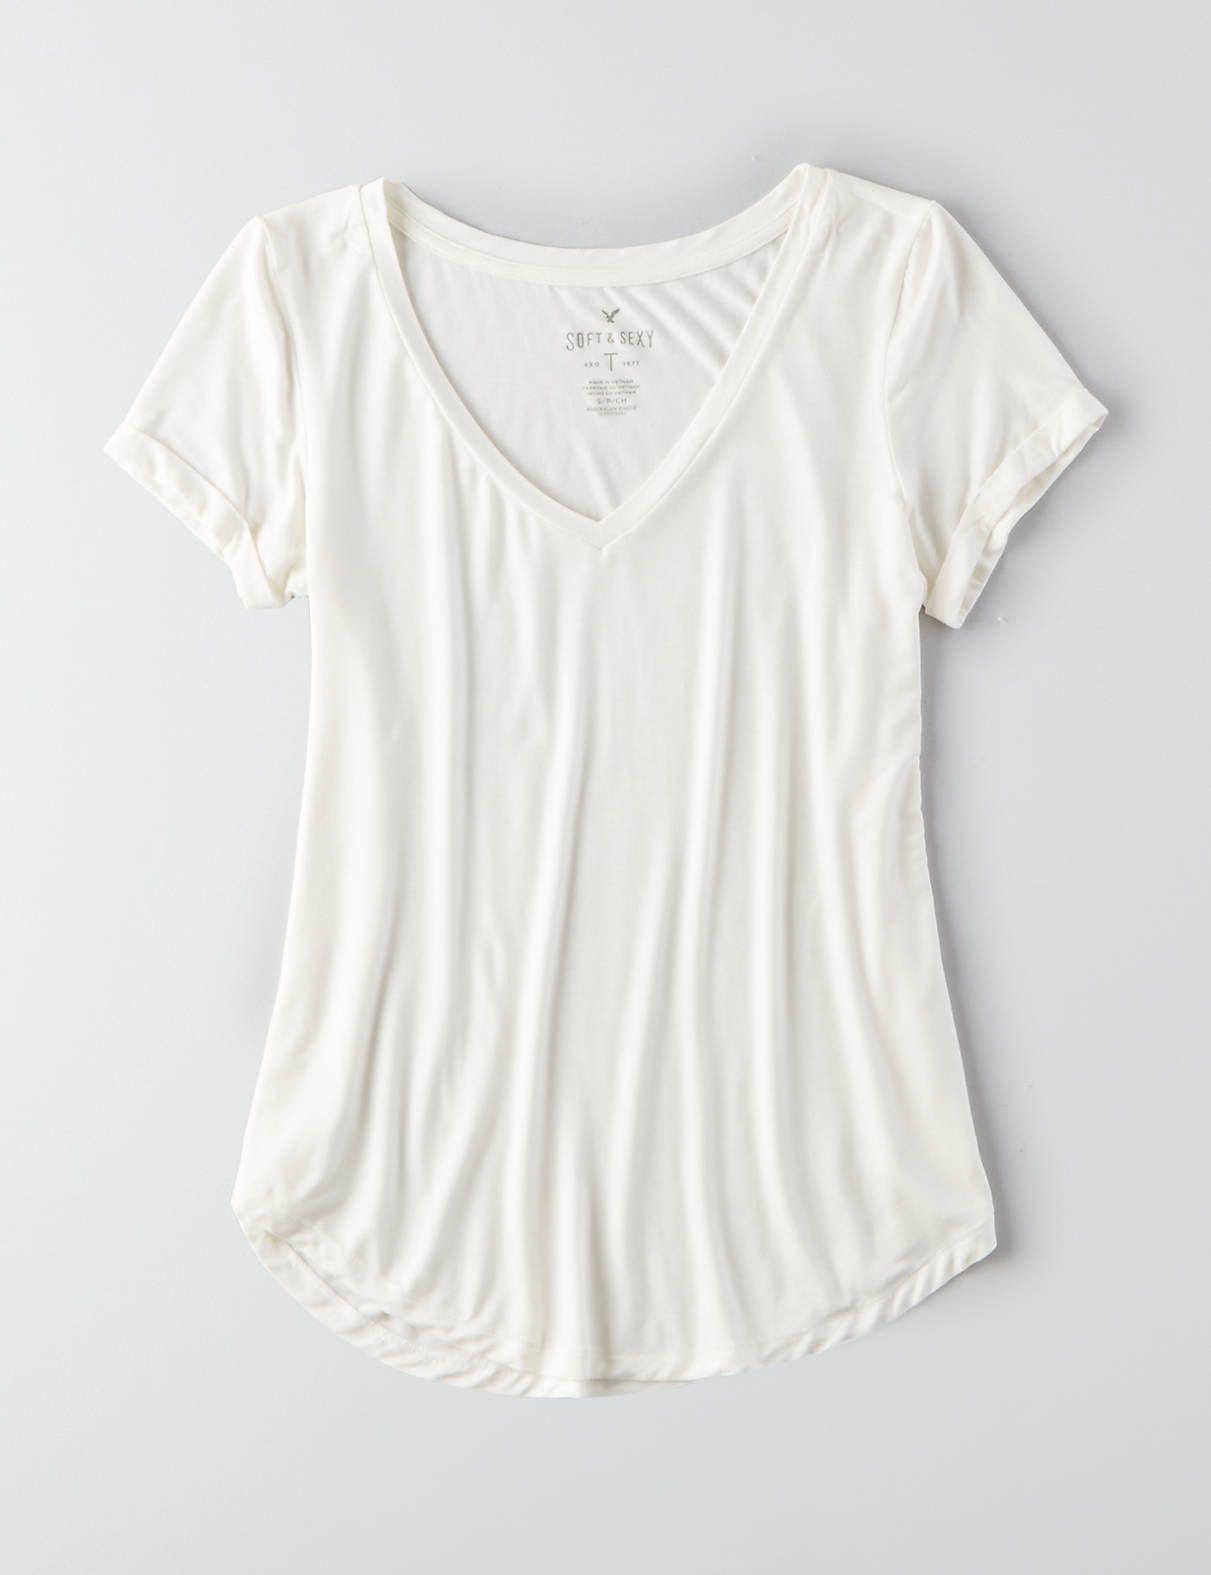 9e8f1b295e8acc AEO Soft   Sexy Favorite T-Shirt